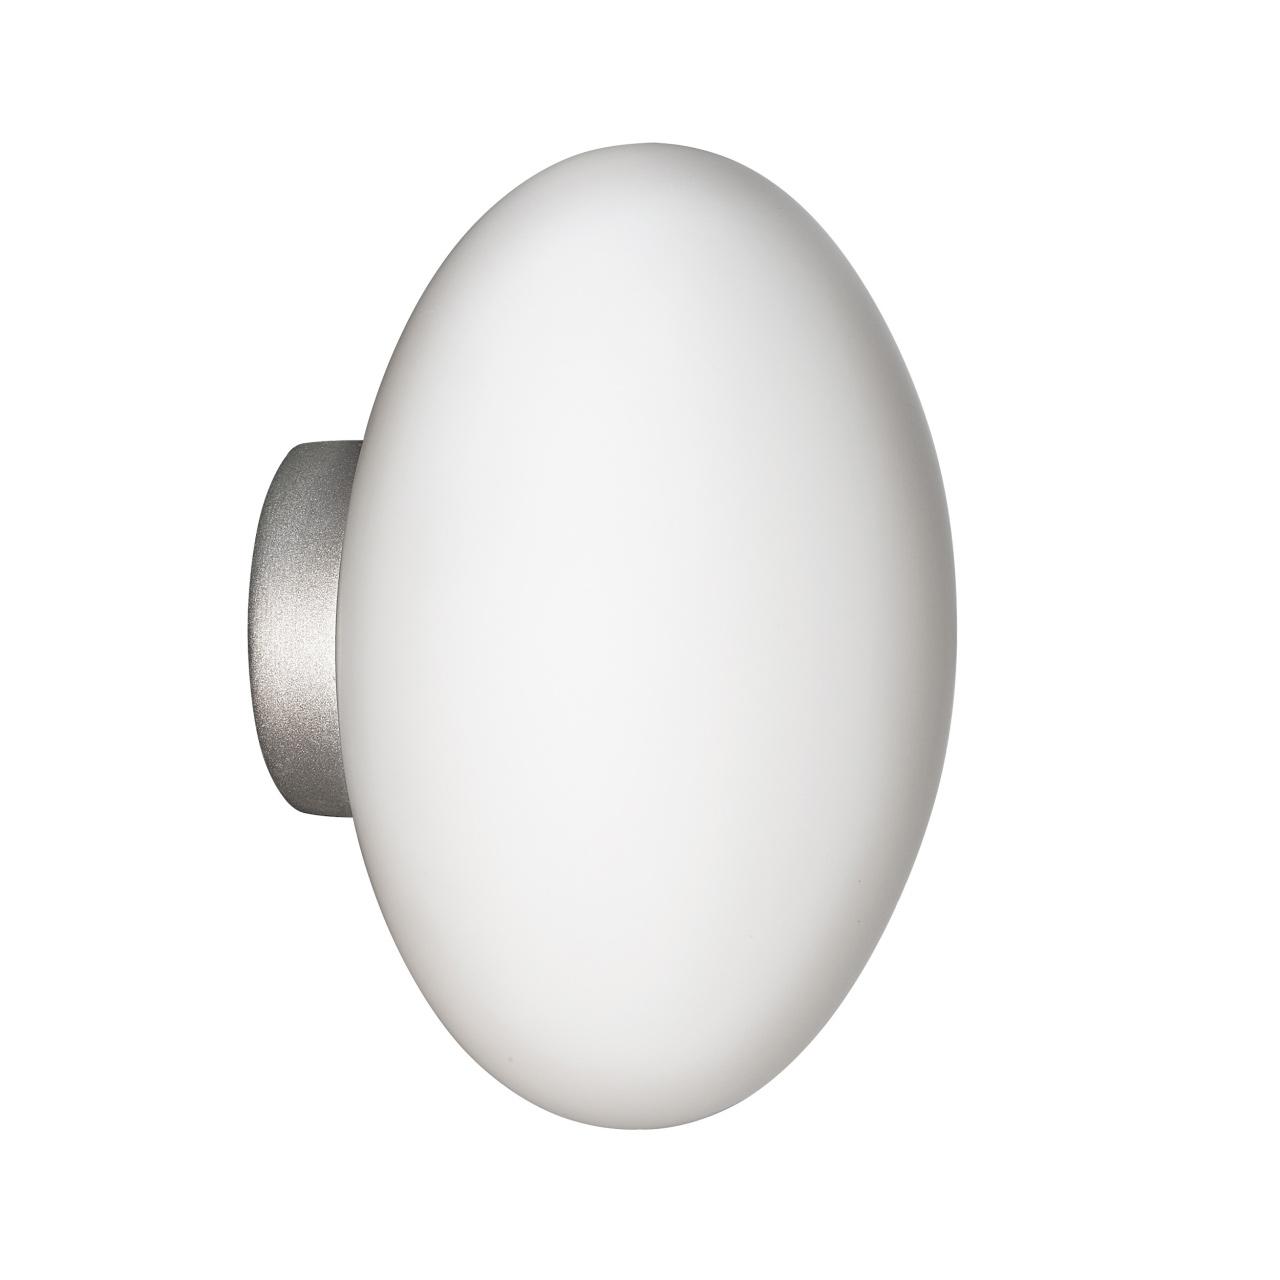 Светильник Uovo 1х40W G9 белый/ хром Lightstar 807010